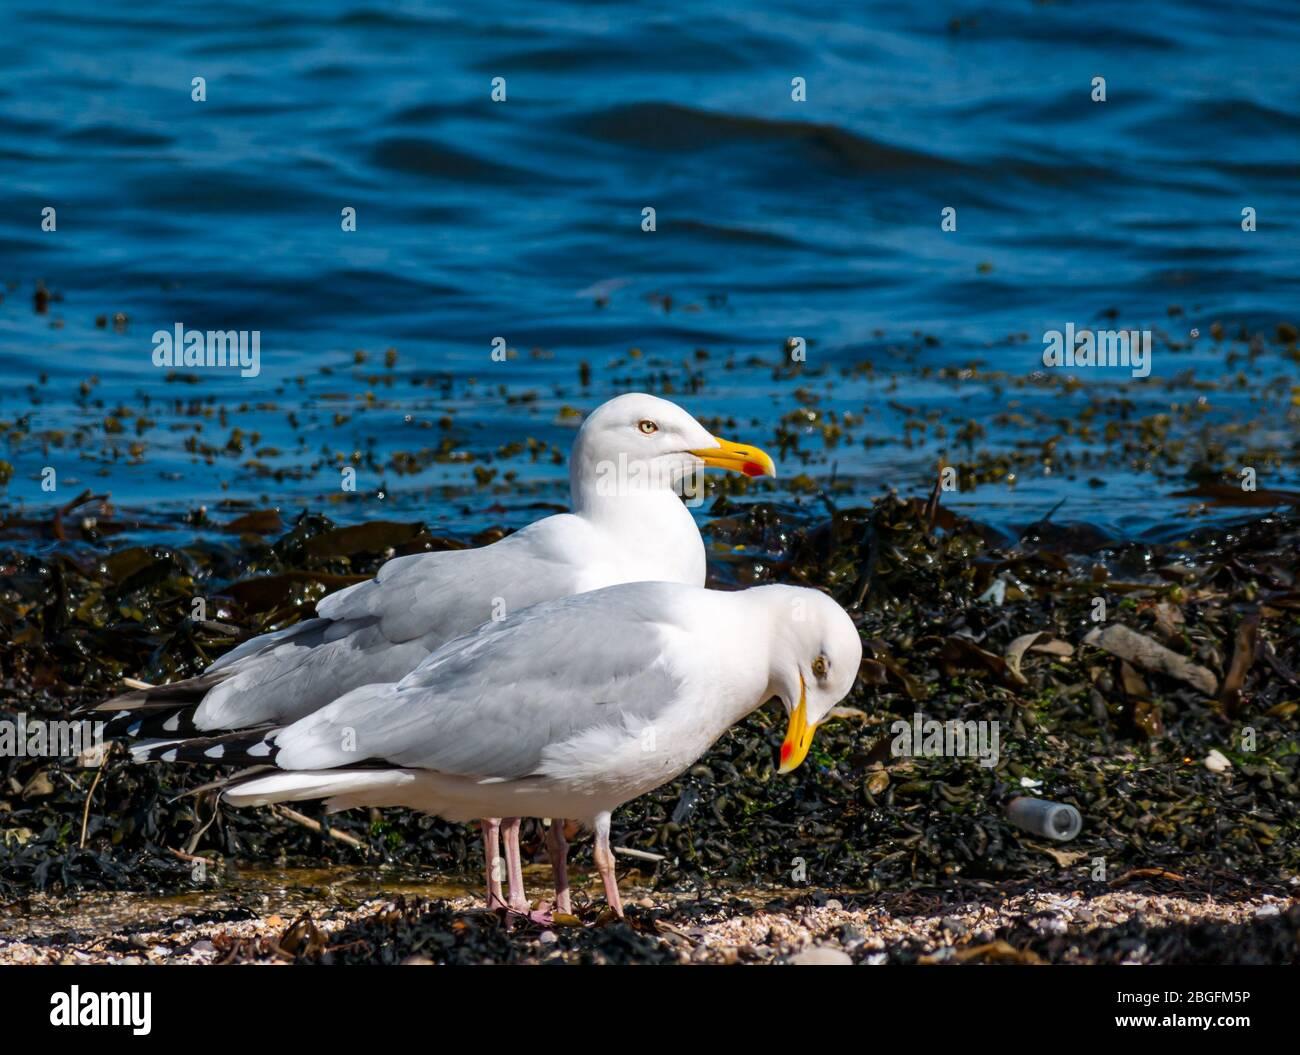 North Berwick, East Lothian, Scotland, United Kingdom. 21st April 2020.  A pair of herring gulls (Larus argentatus) on the shoreline of East beach in Milsey bay Stock Photo